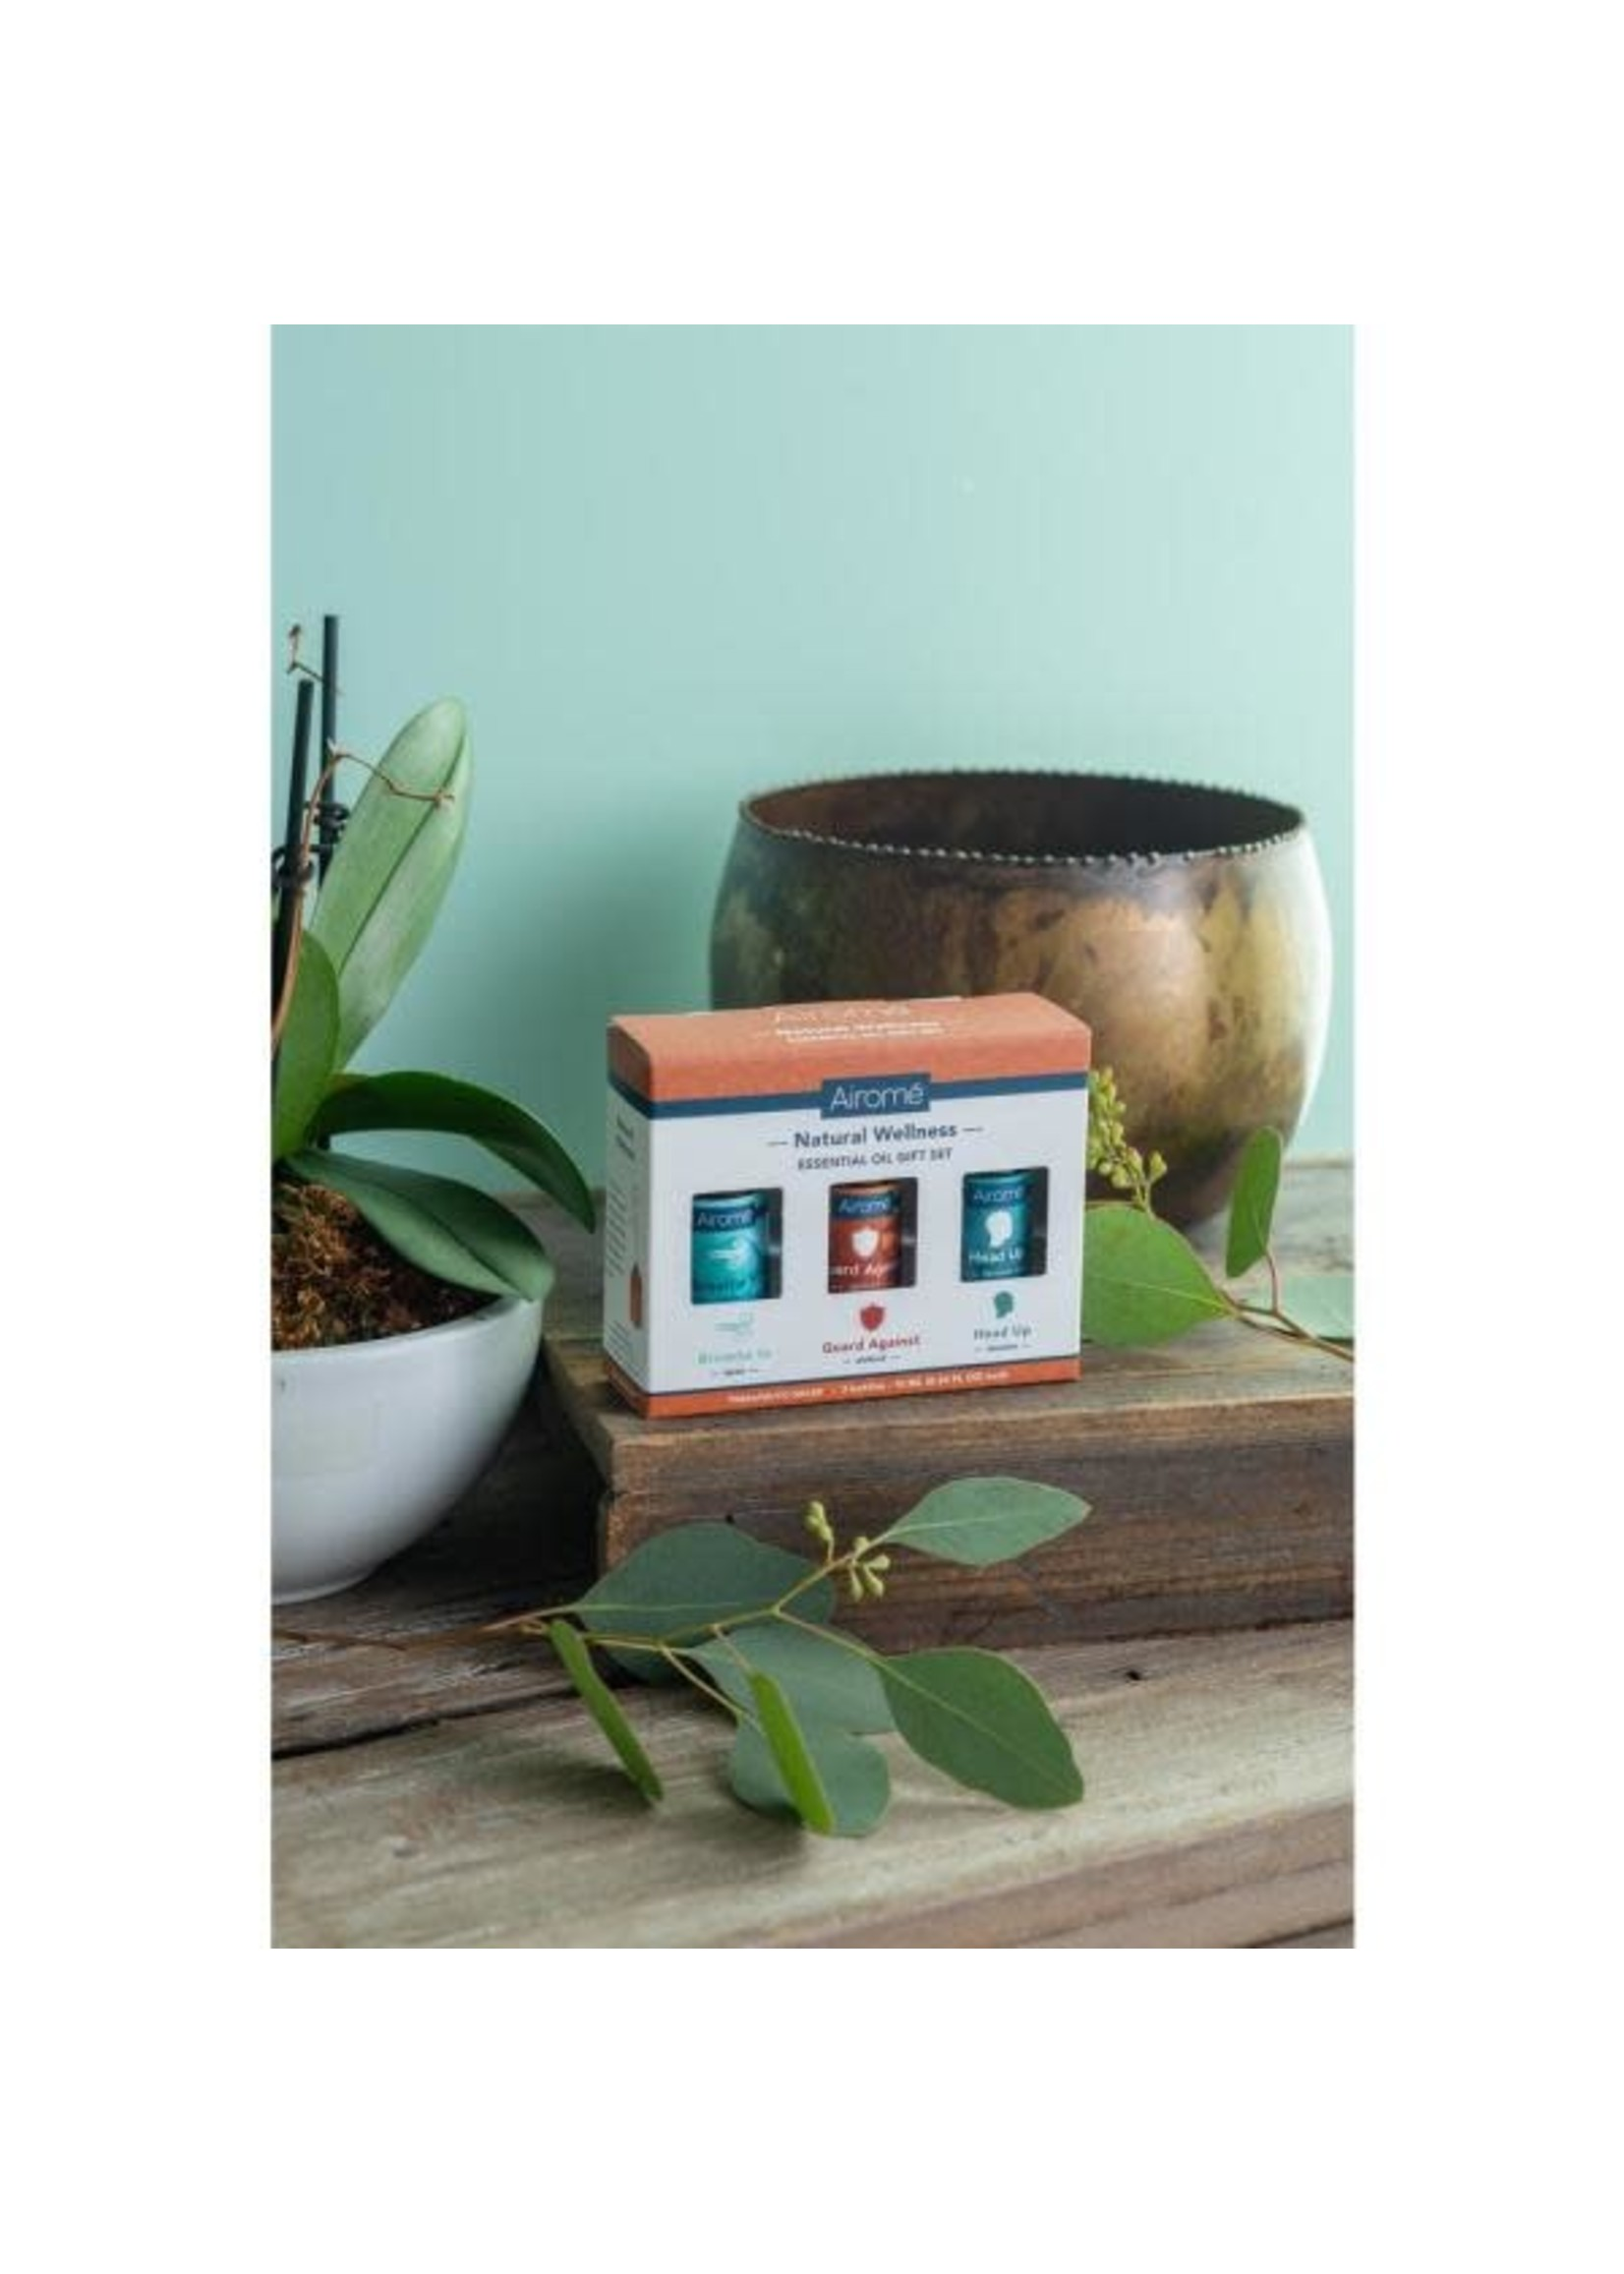 Airome Natural Wellness pack of 3 Essentials Oils 10ml each